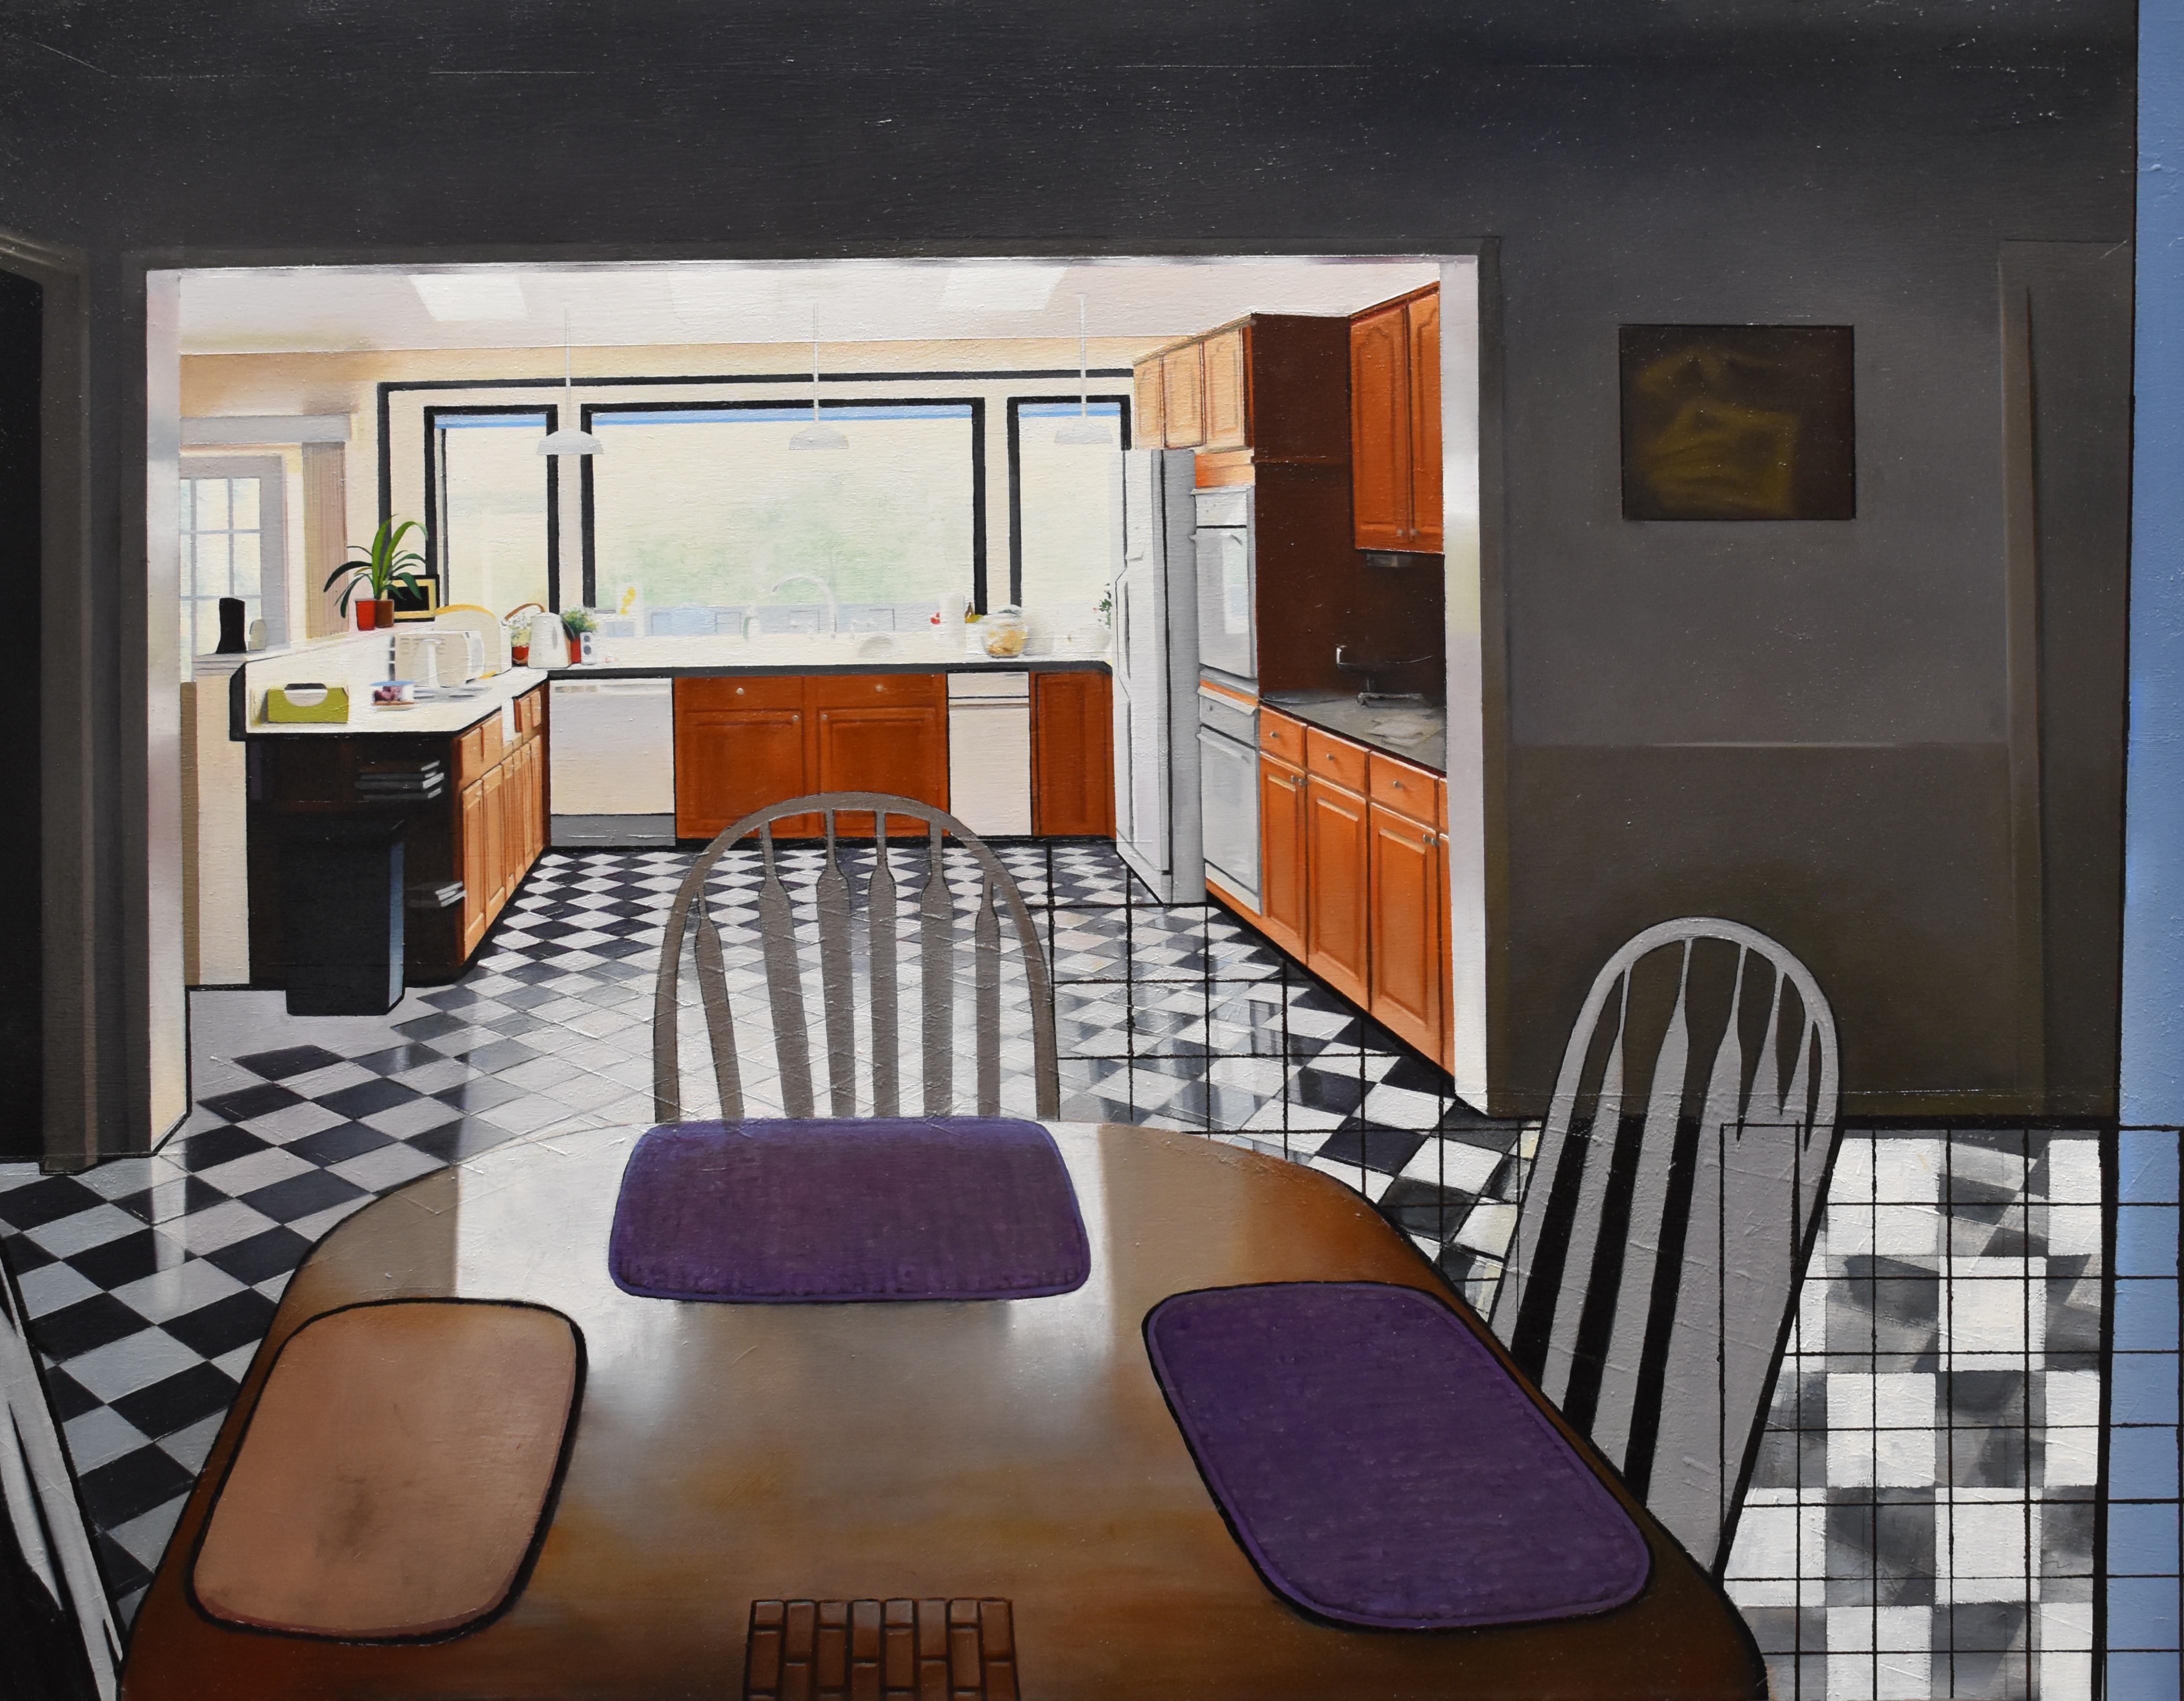 Hillsdale Kitchen, graphic surrealist interior oil painting, 2012